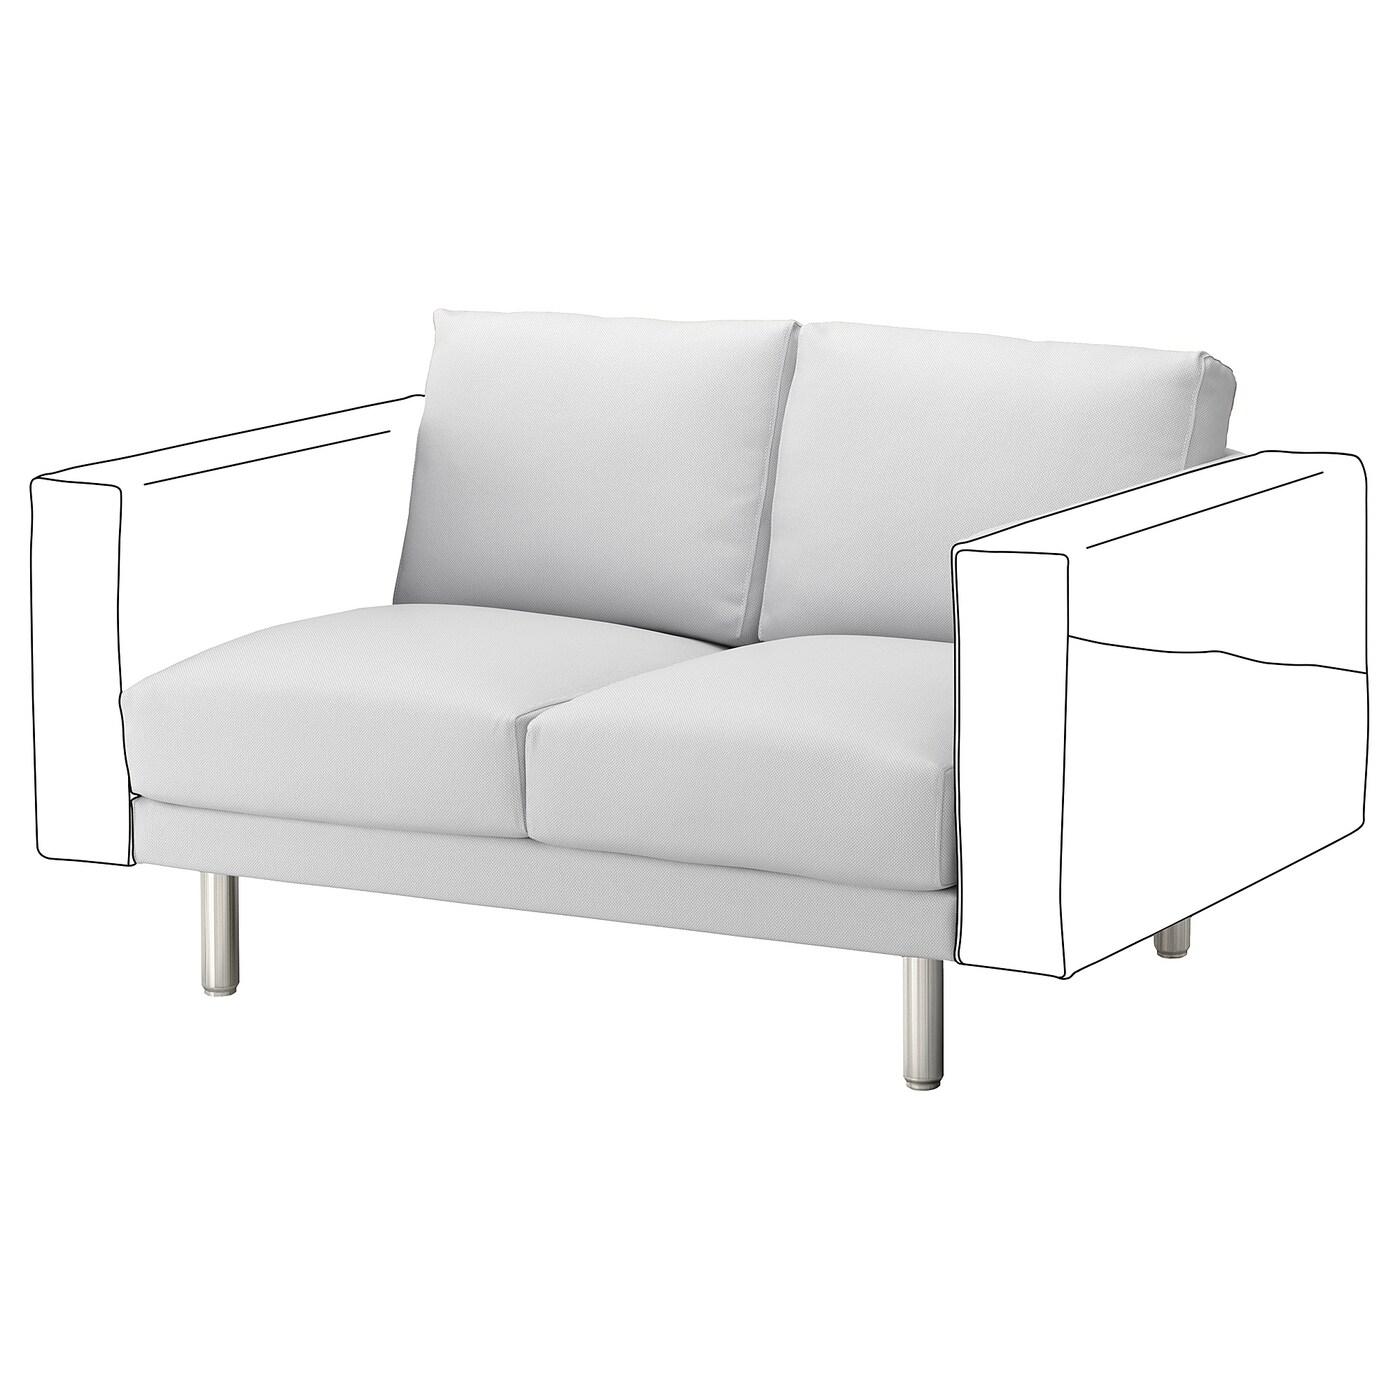 preview of norsborg. Black Bedroom Furniture Sets. Home Design Ideas